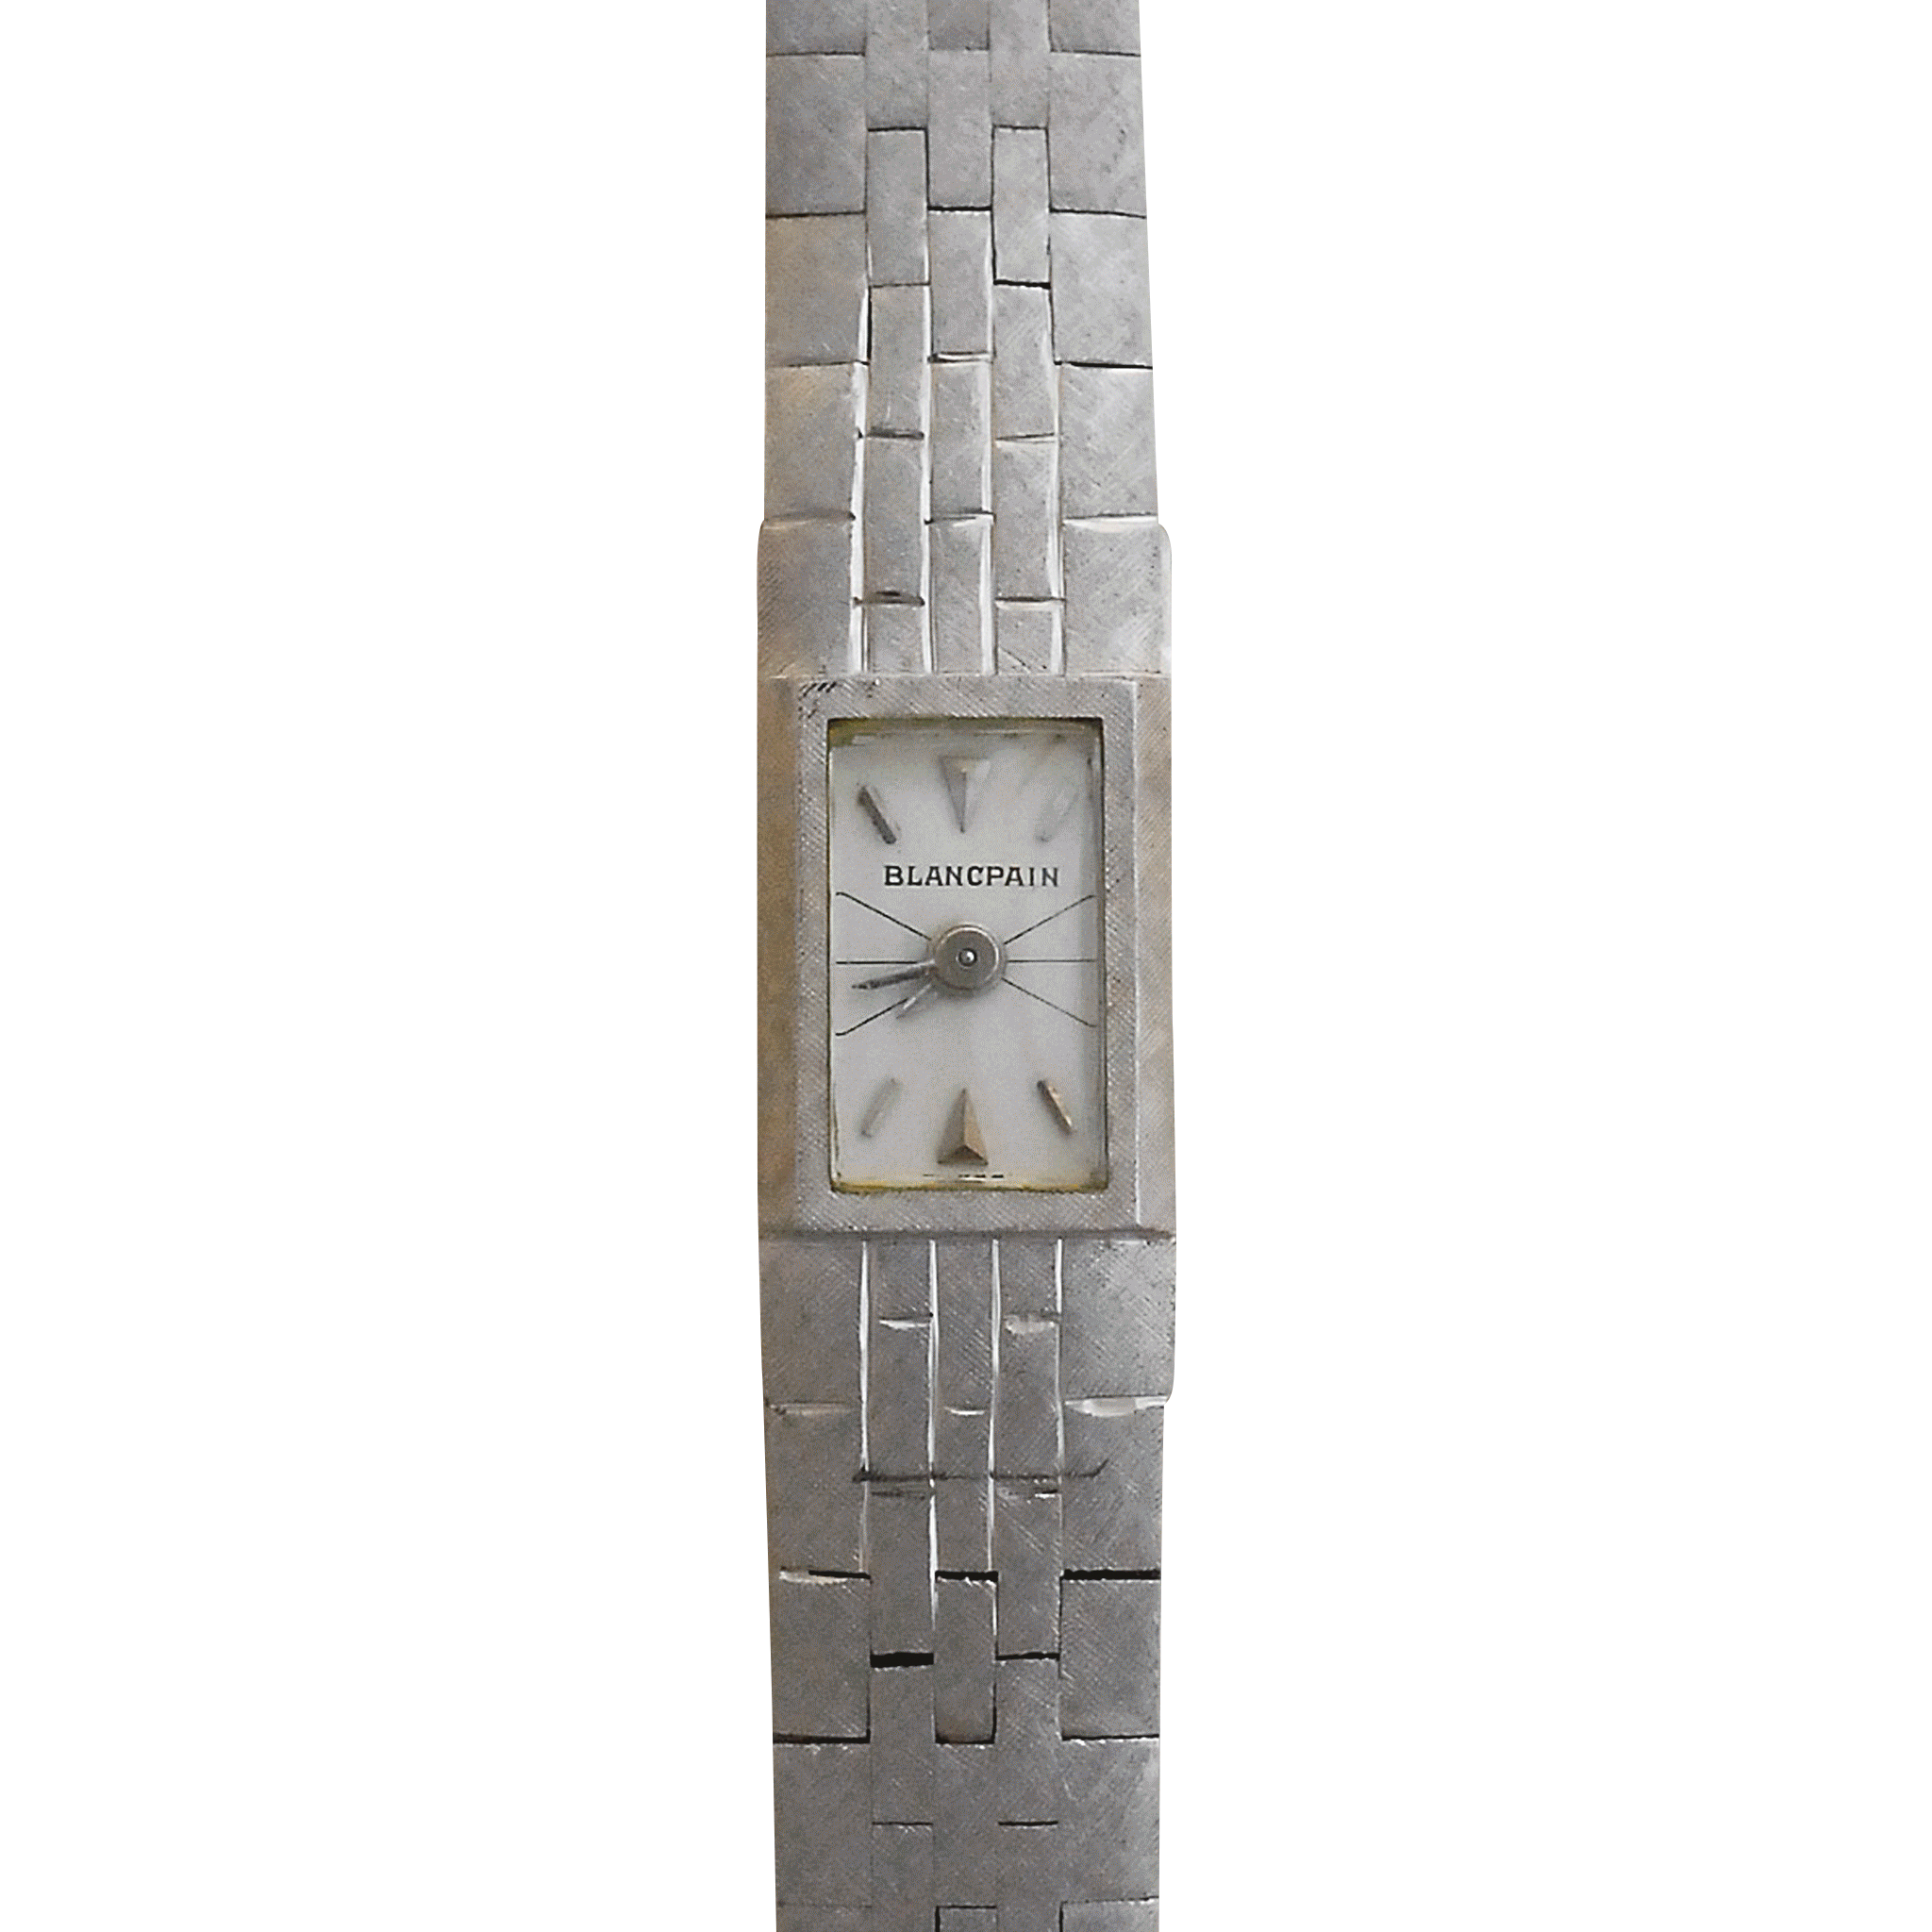 Ladies 17 Jewel Wrist Watch by Blancpain in 18 Karat White Gold